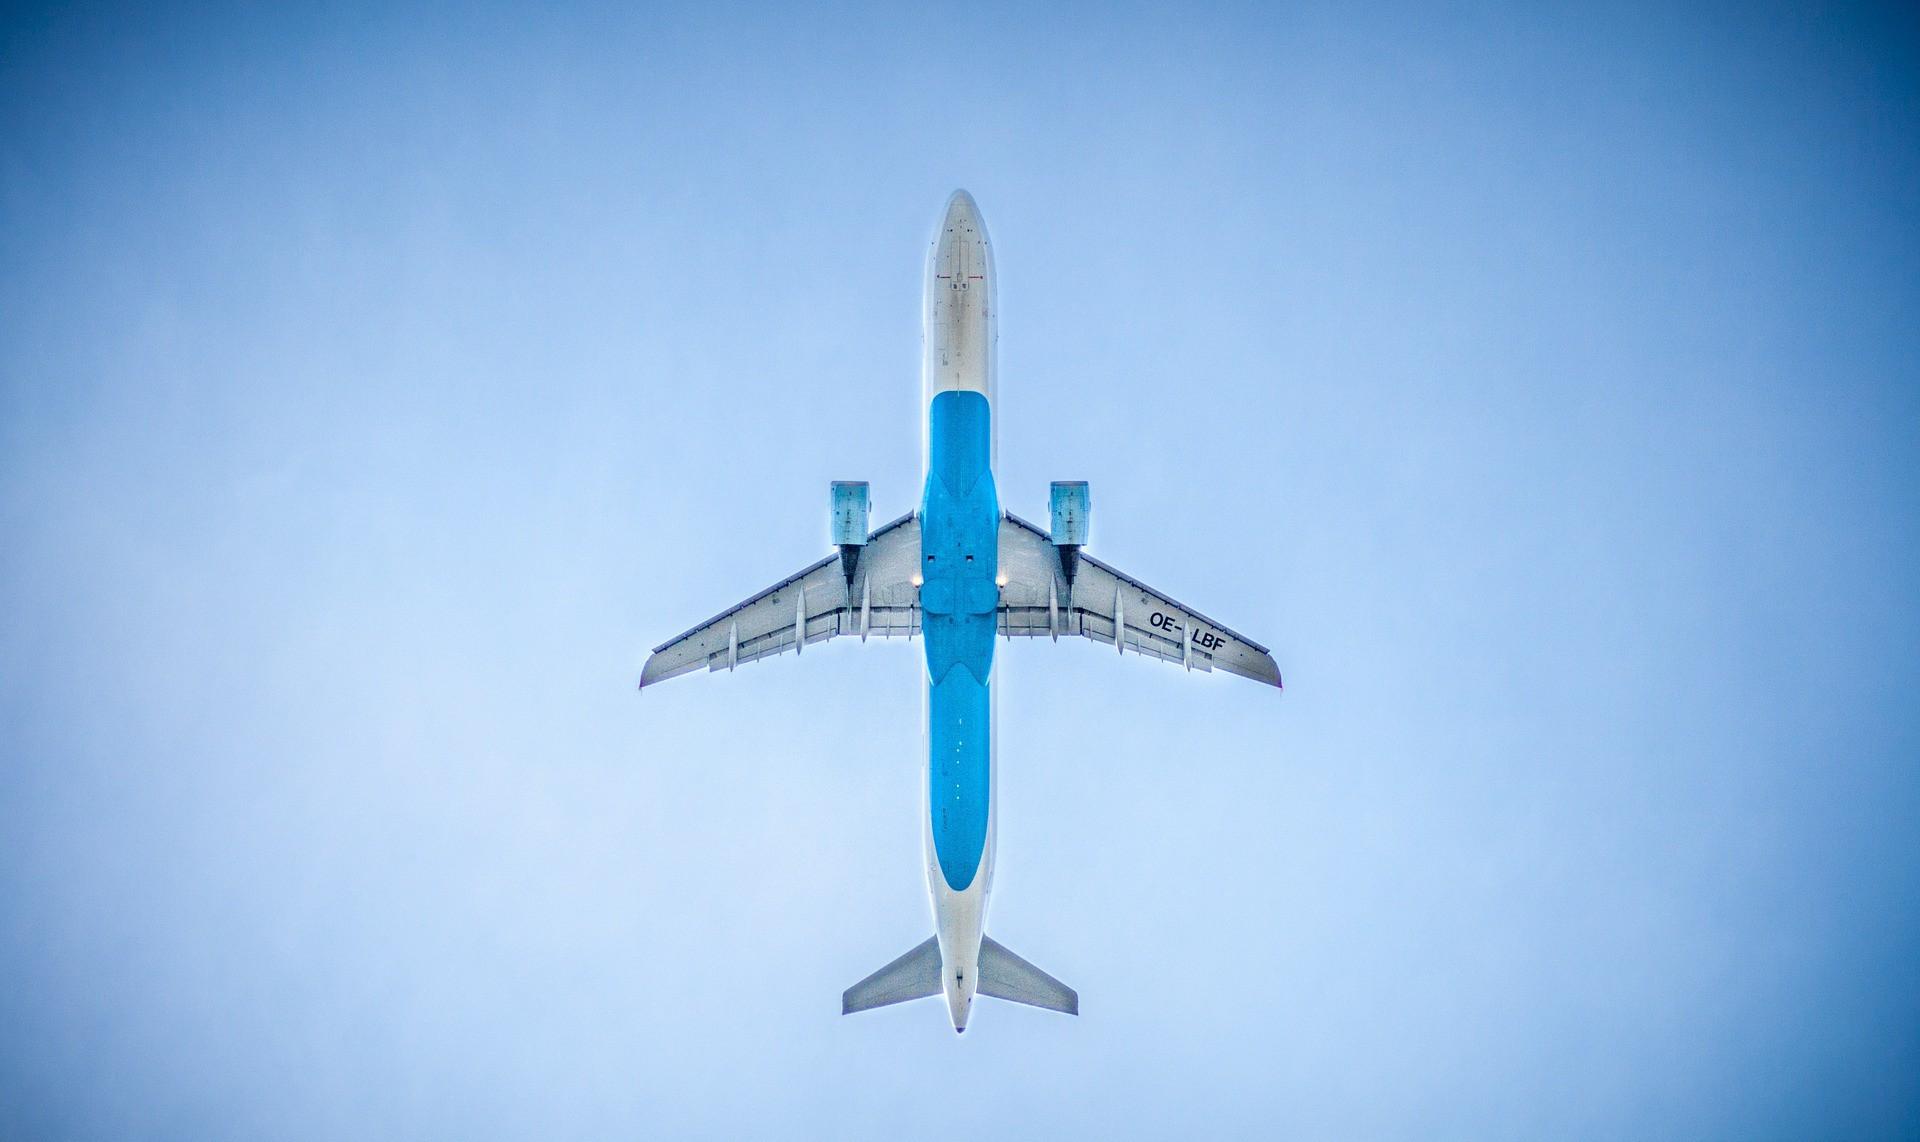 airplane-983991_1920